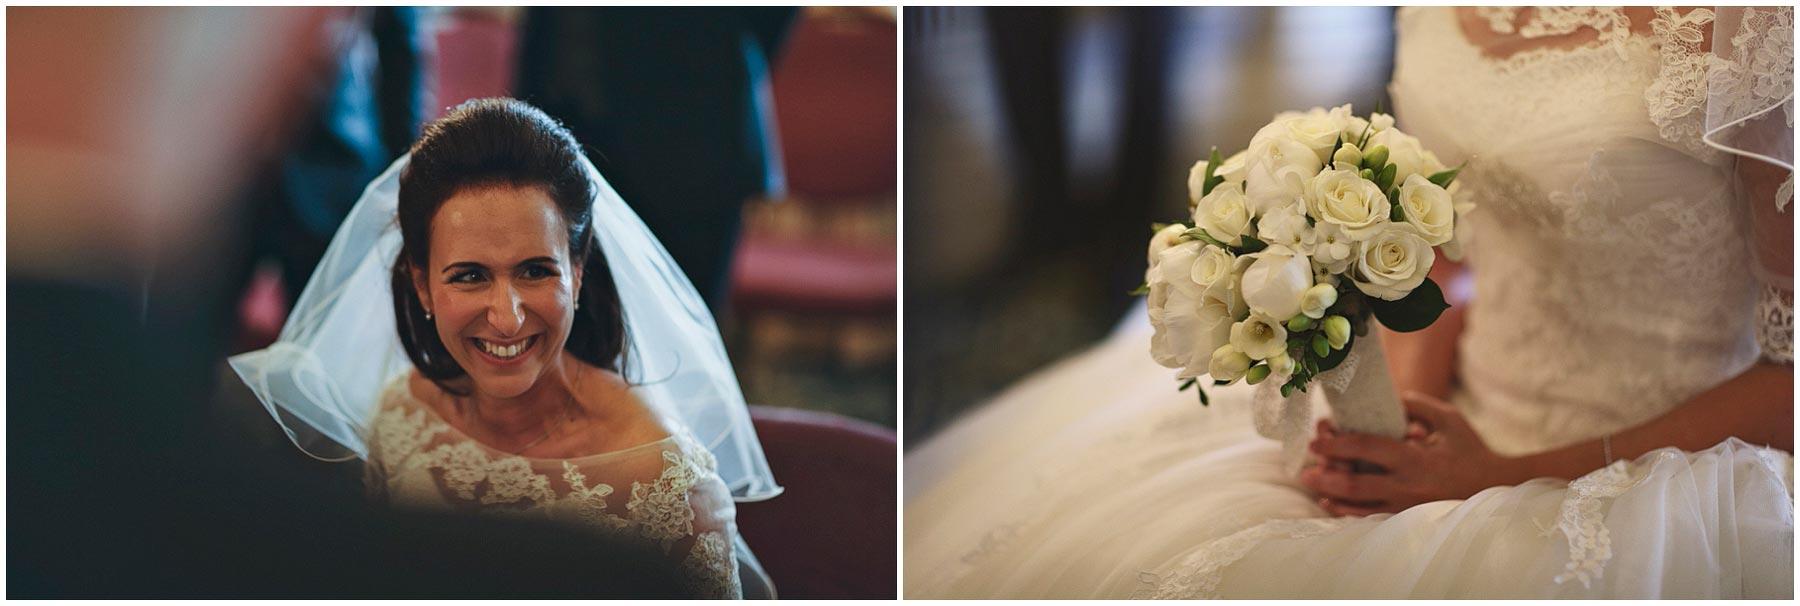 Jewish-Wedding-Photography_0060